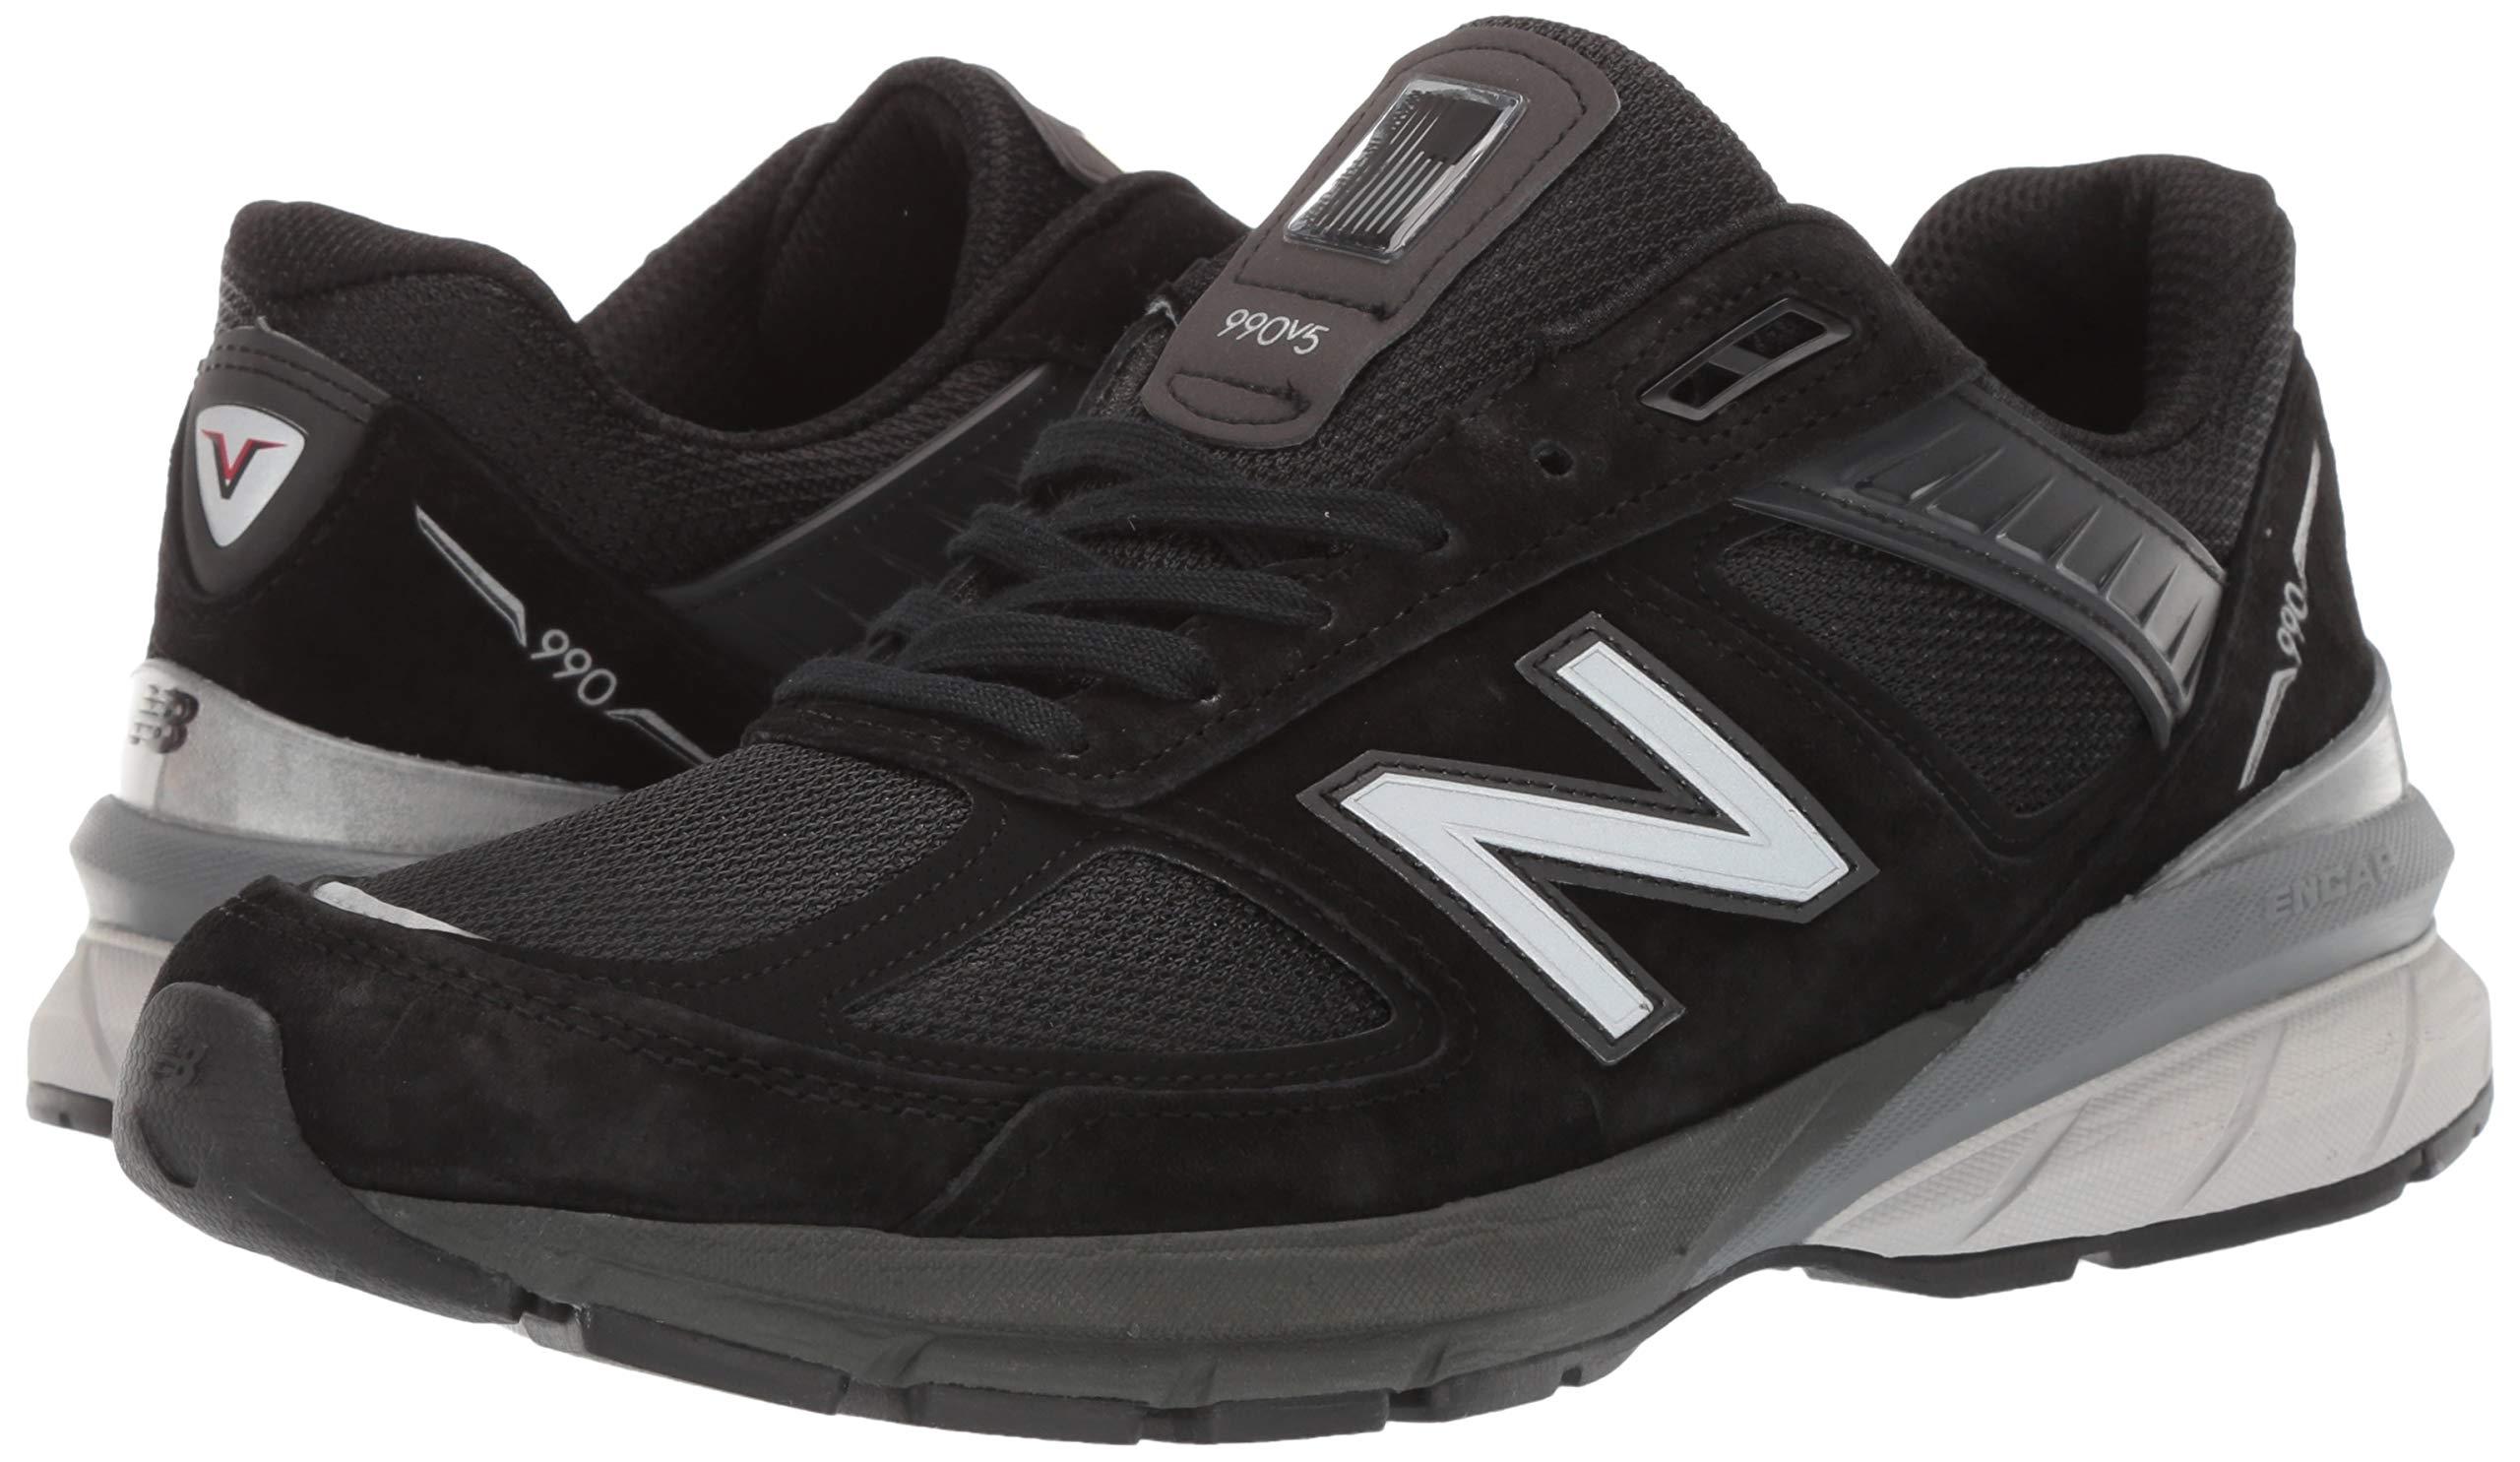 New-Balance-M990v5-Men-039-s-Made-in-USA-GL5-NV5-BK5-BB5 thumbnail 12